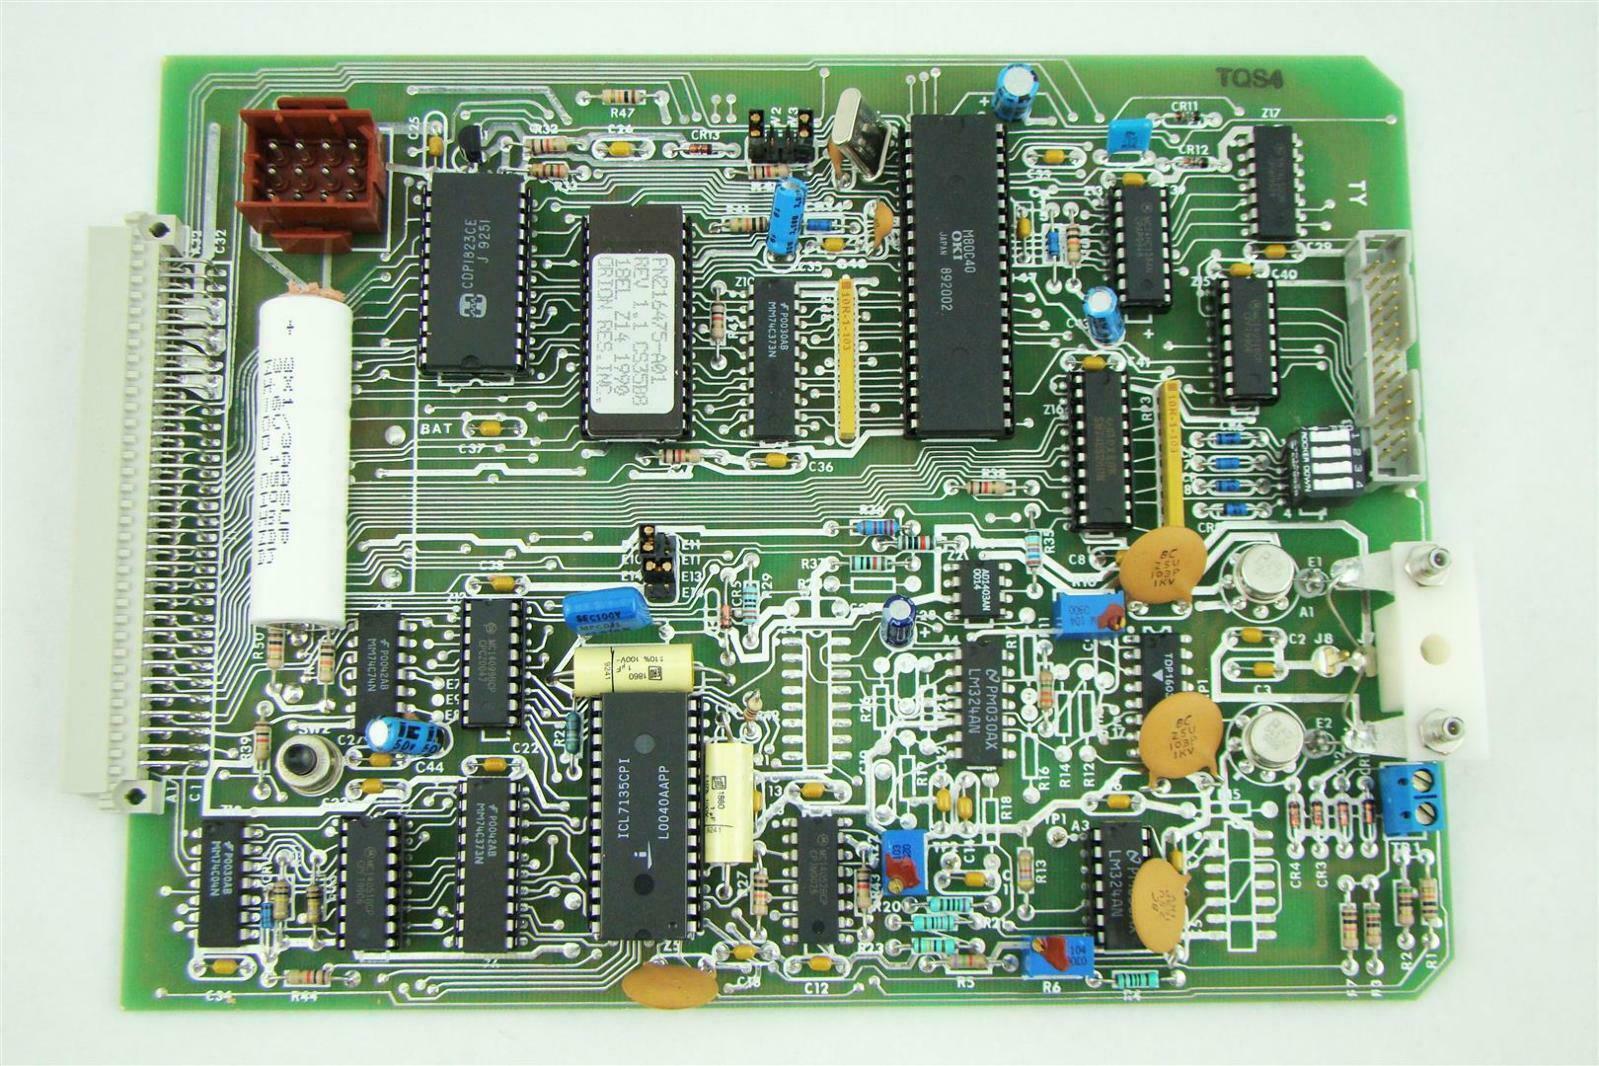 Circuit Board 36v Tqs4 802044 Ebay Printed Fuse Holders